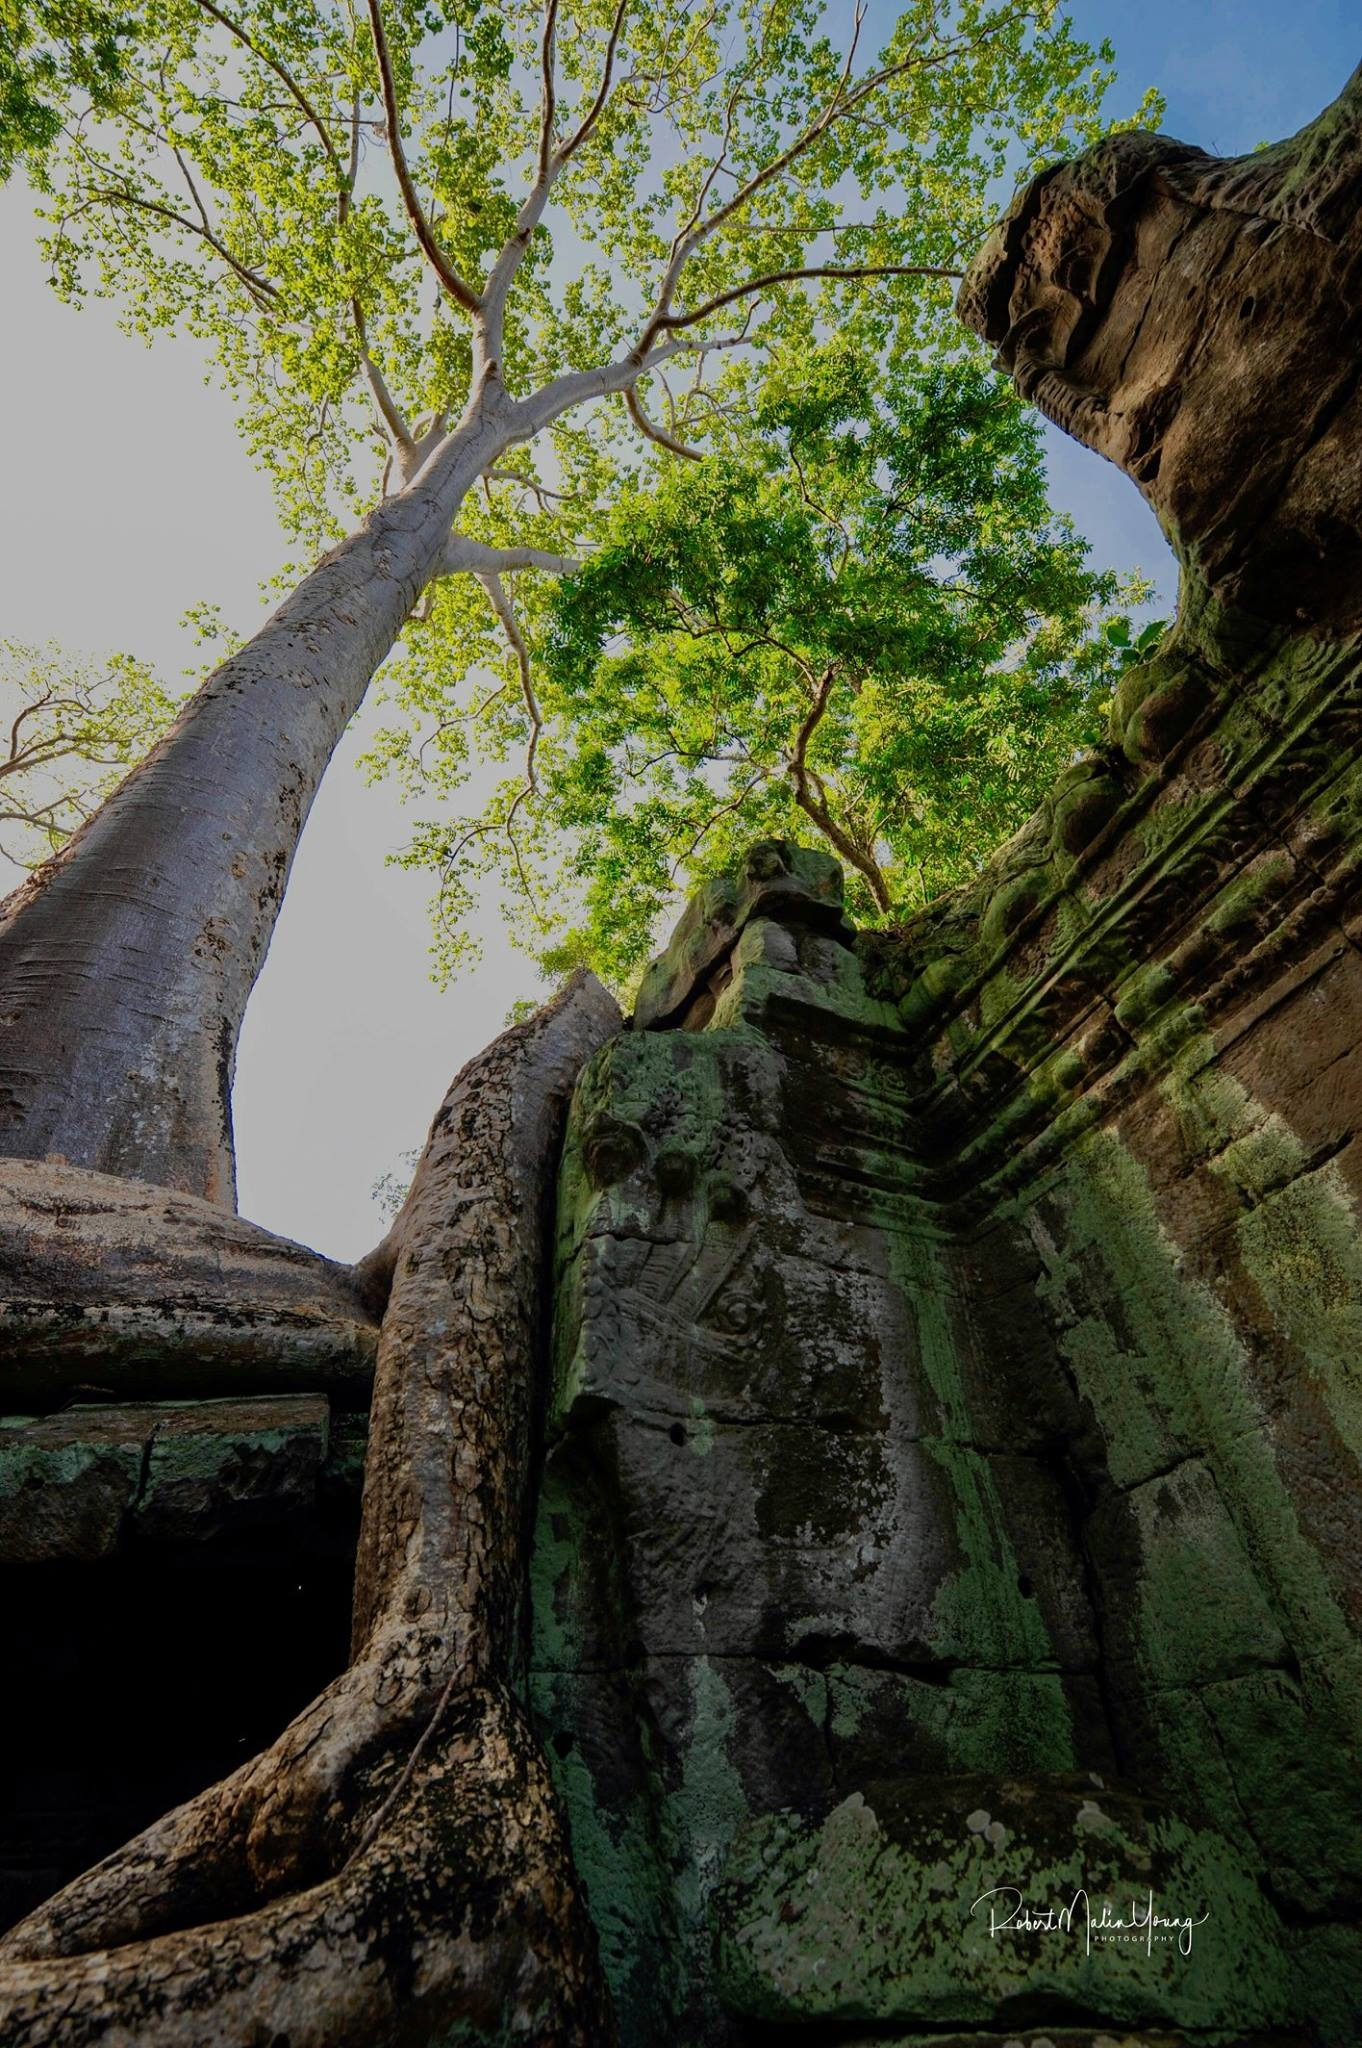 Anchor Thom, Cambodia 2018 by Robert Malin Young